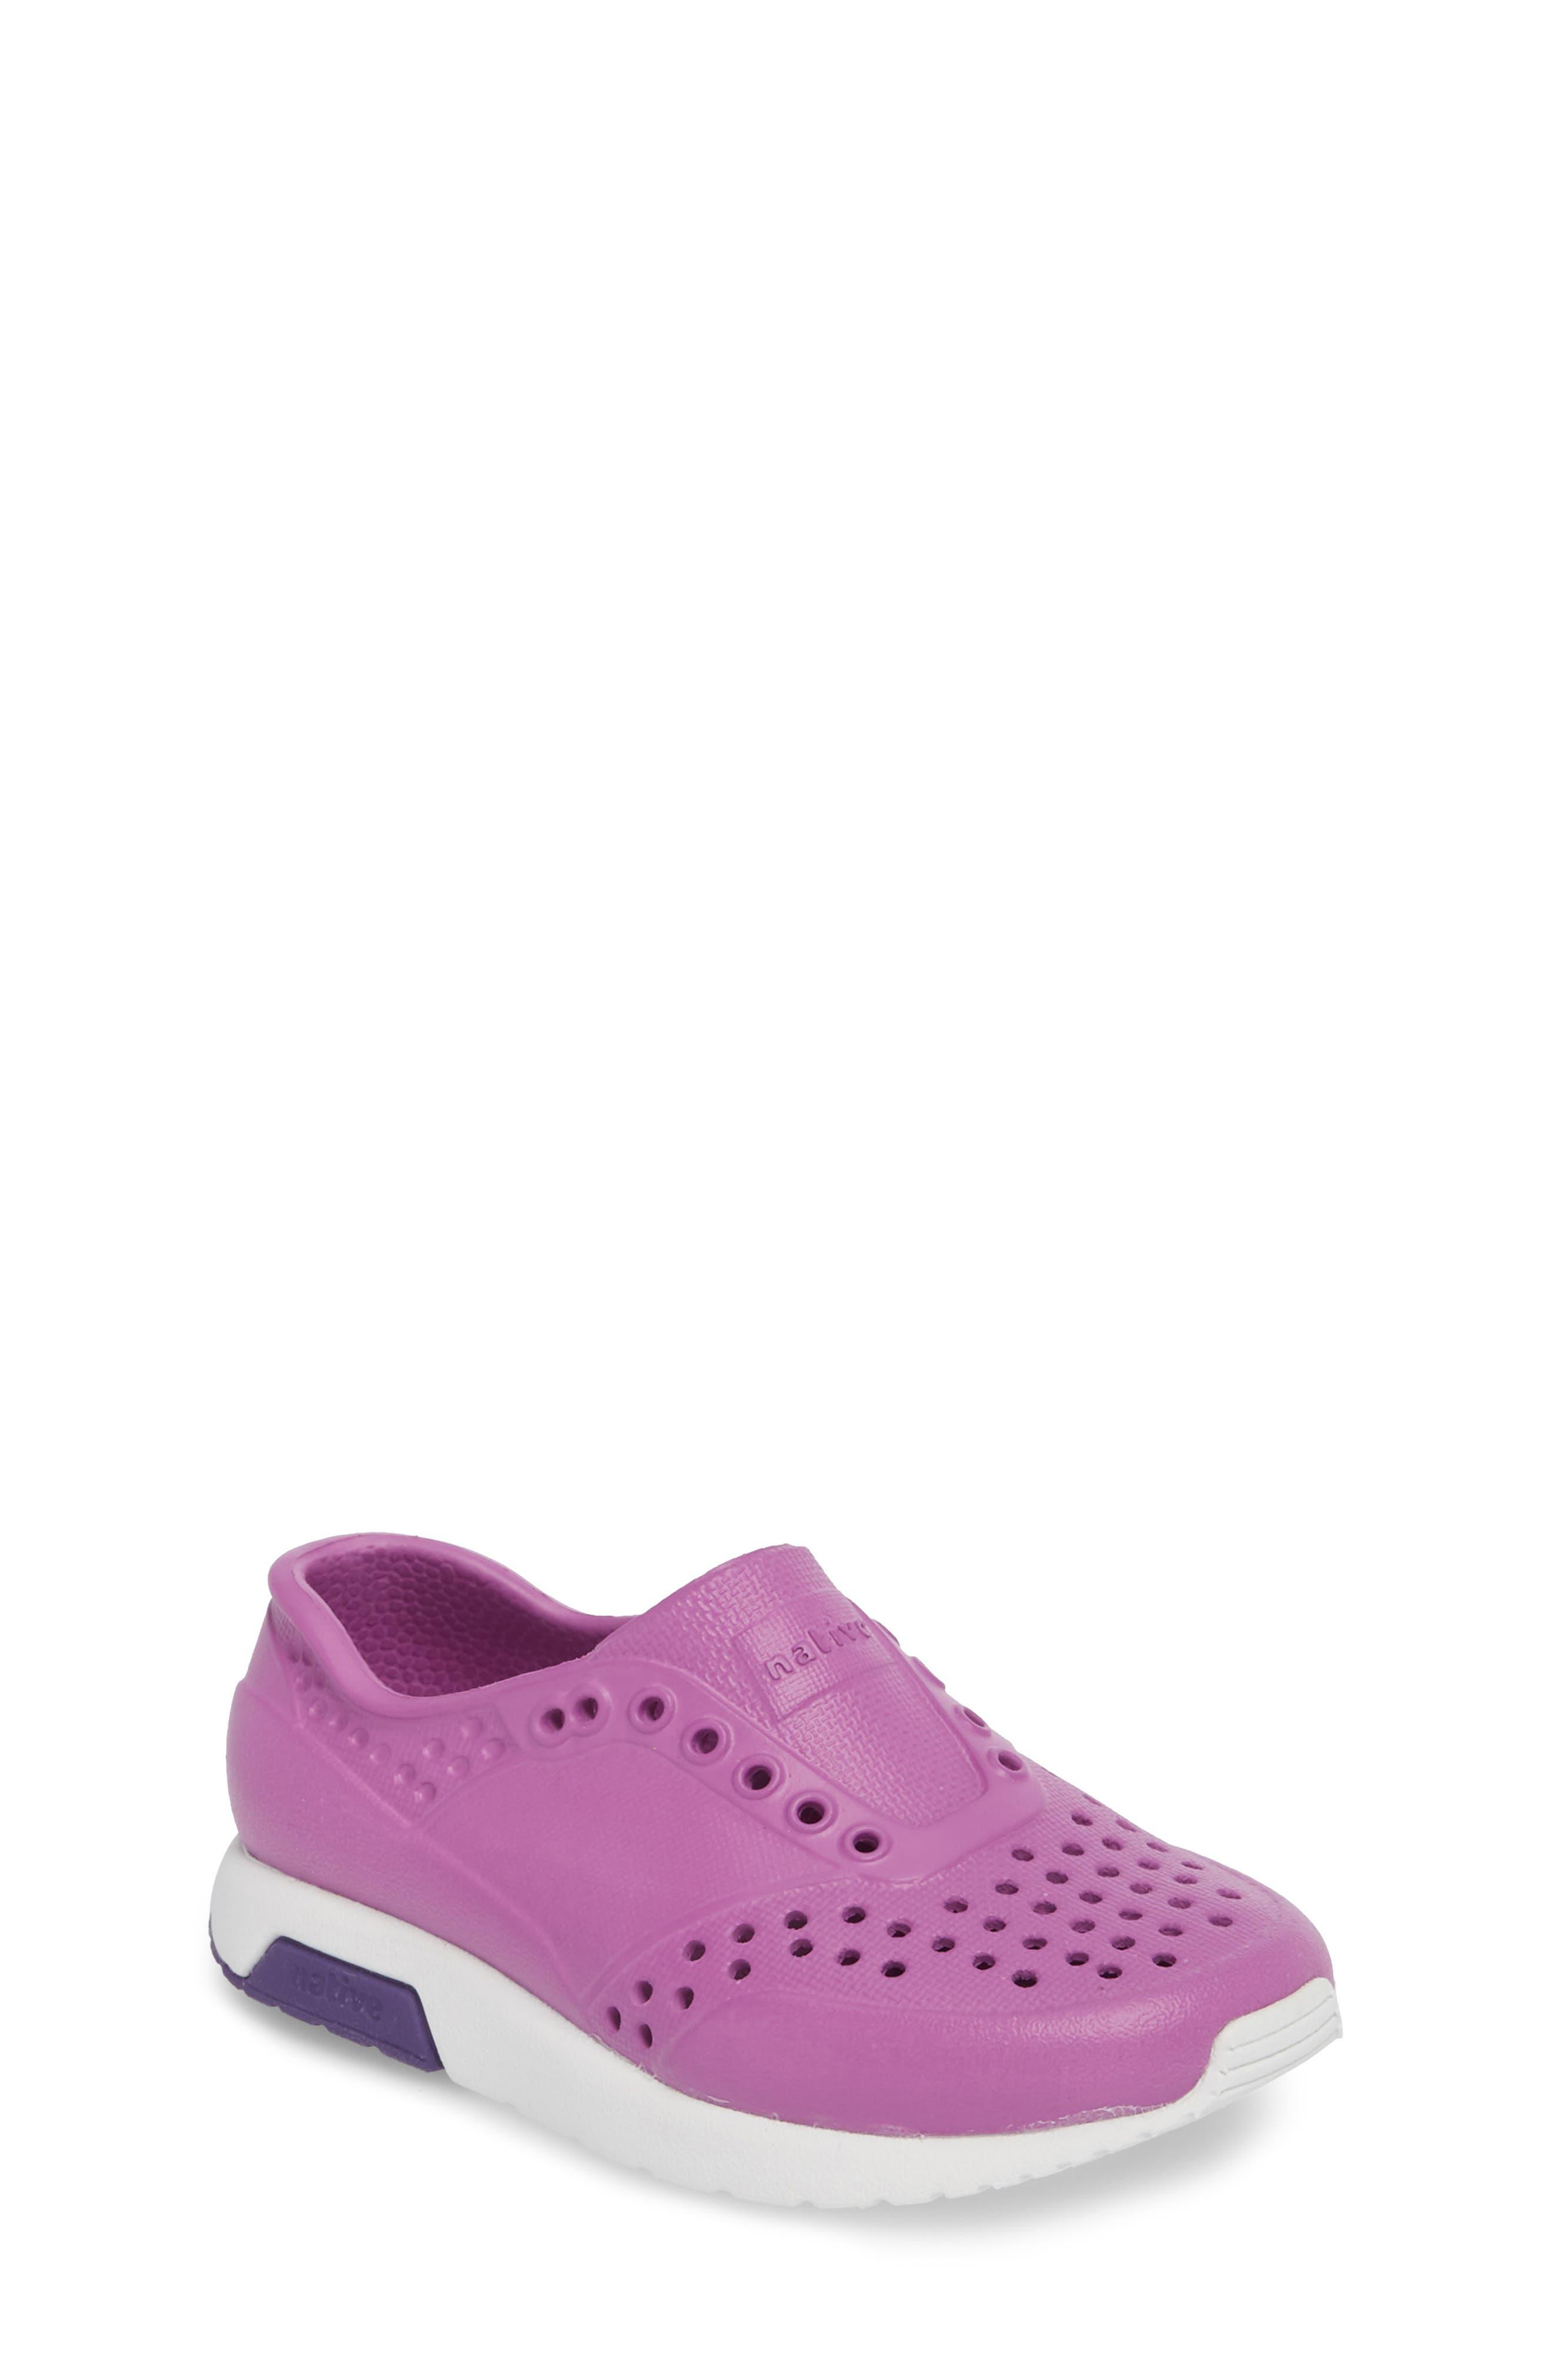 Lennox Slip-On Sneaker,                             Main thumbnail 1, color,                             Peace Purple/ Shell White